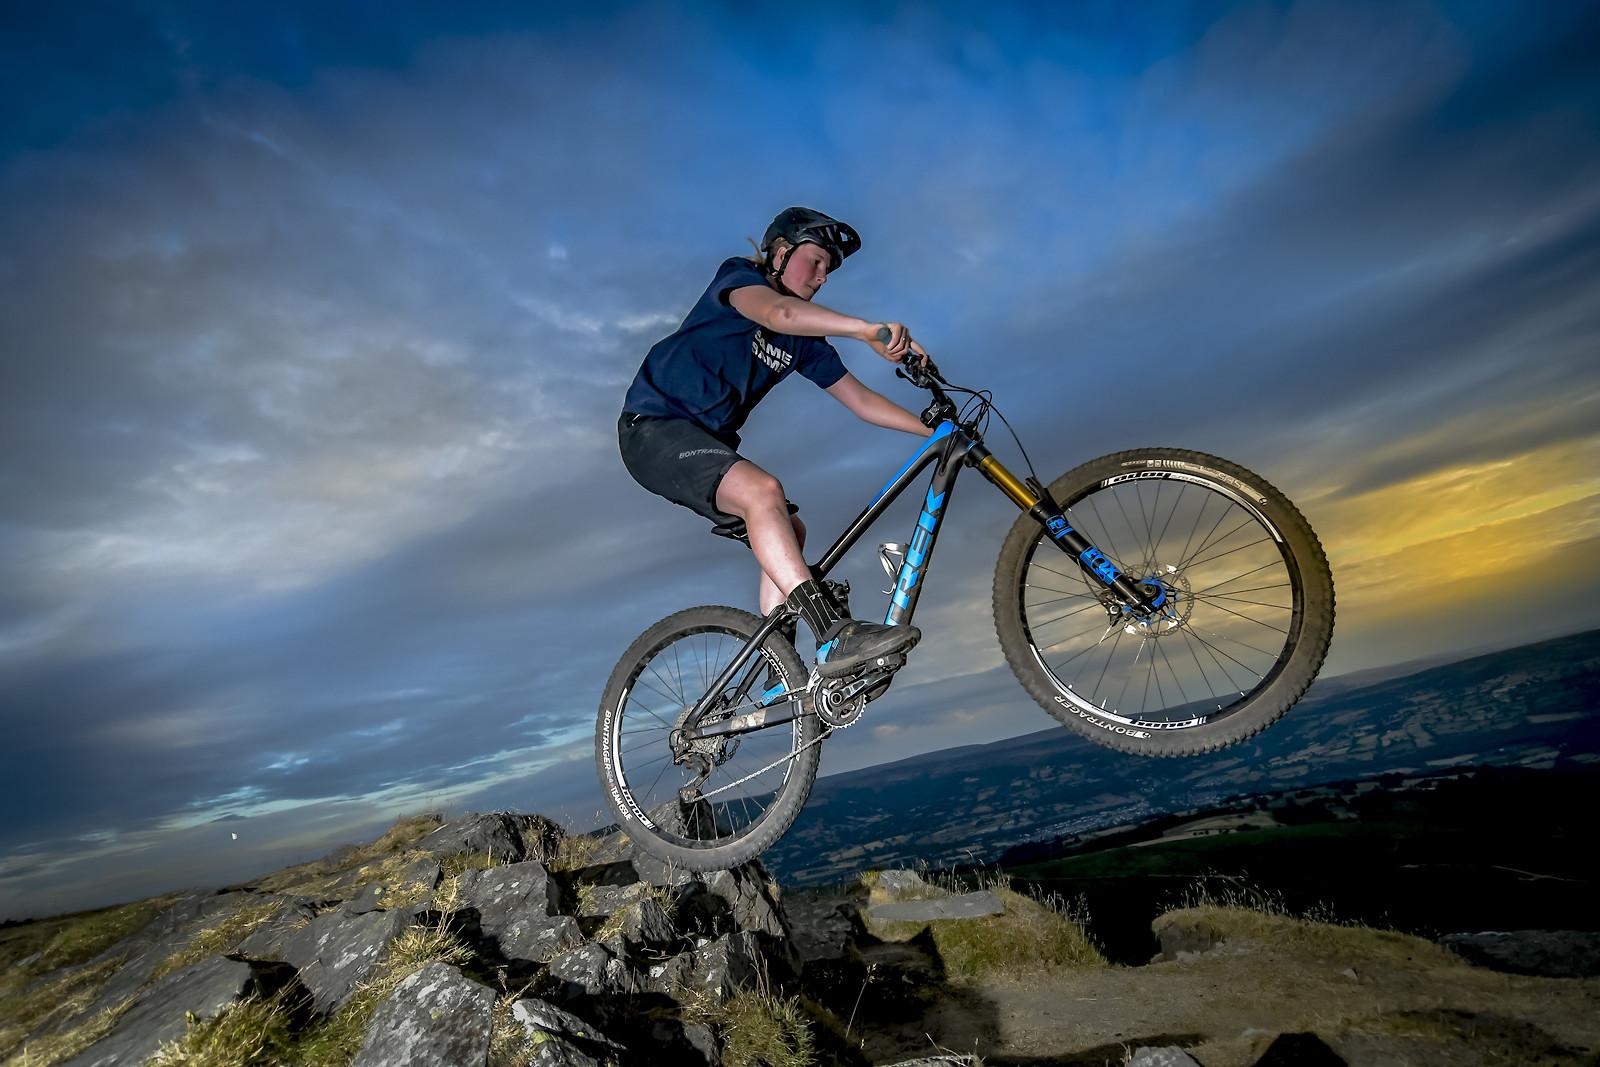 ROB2181 - robbarkerimages2017 - Mountain Biking Pictures - Vital MTB